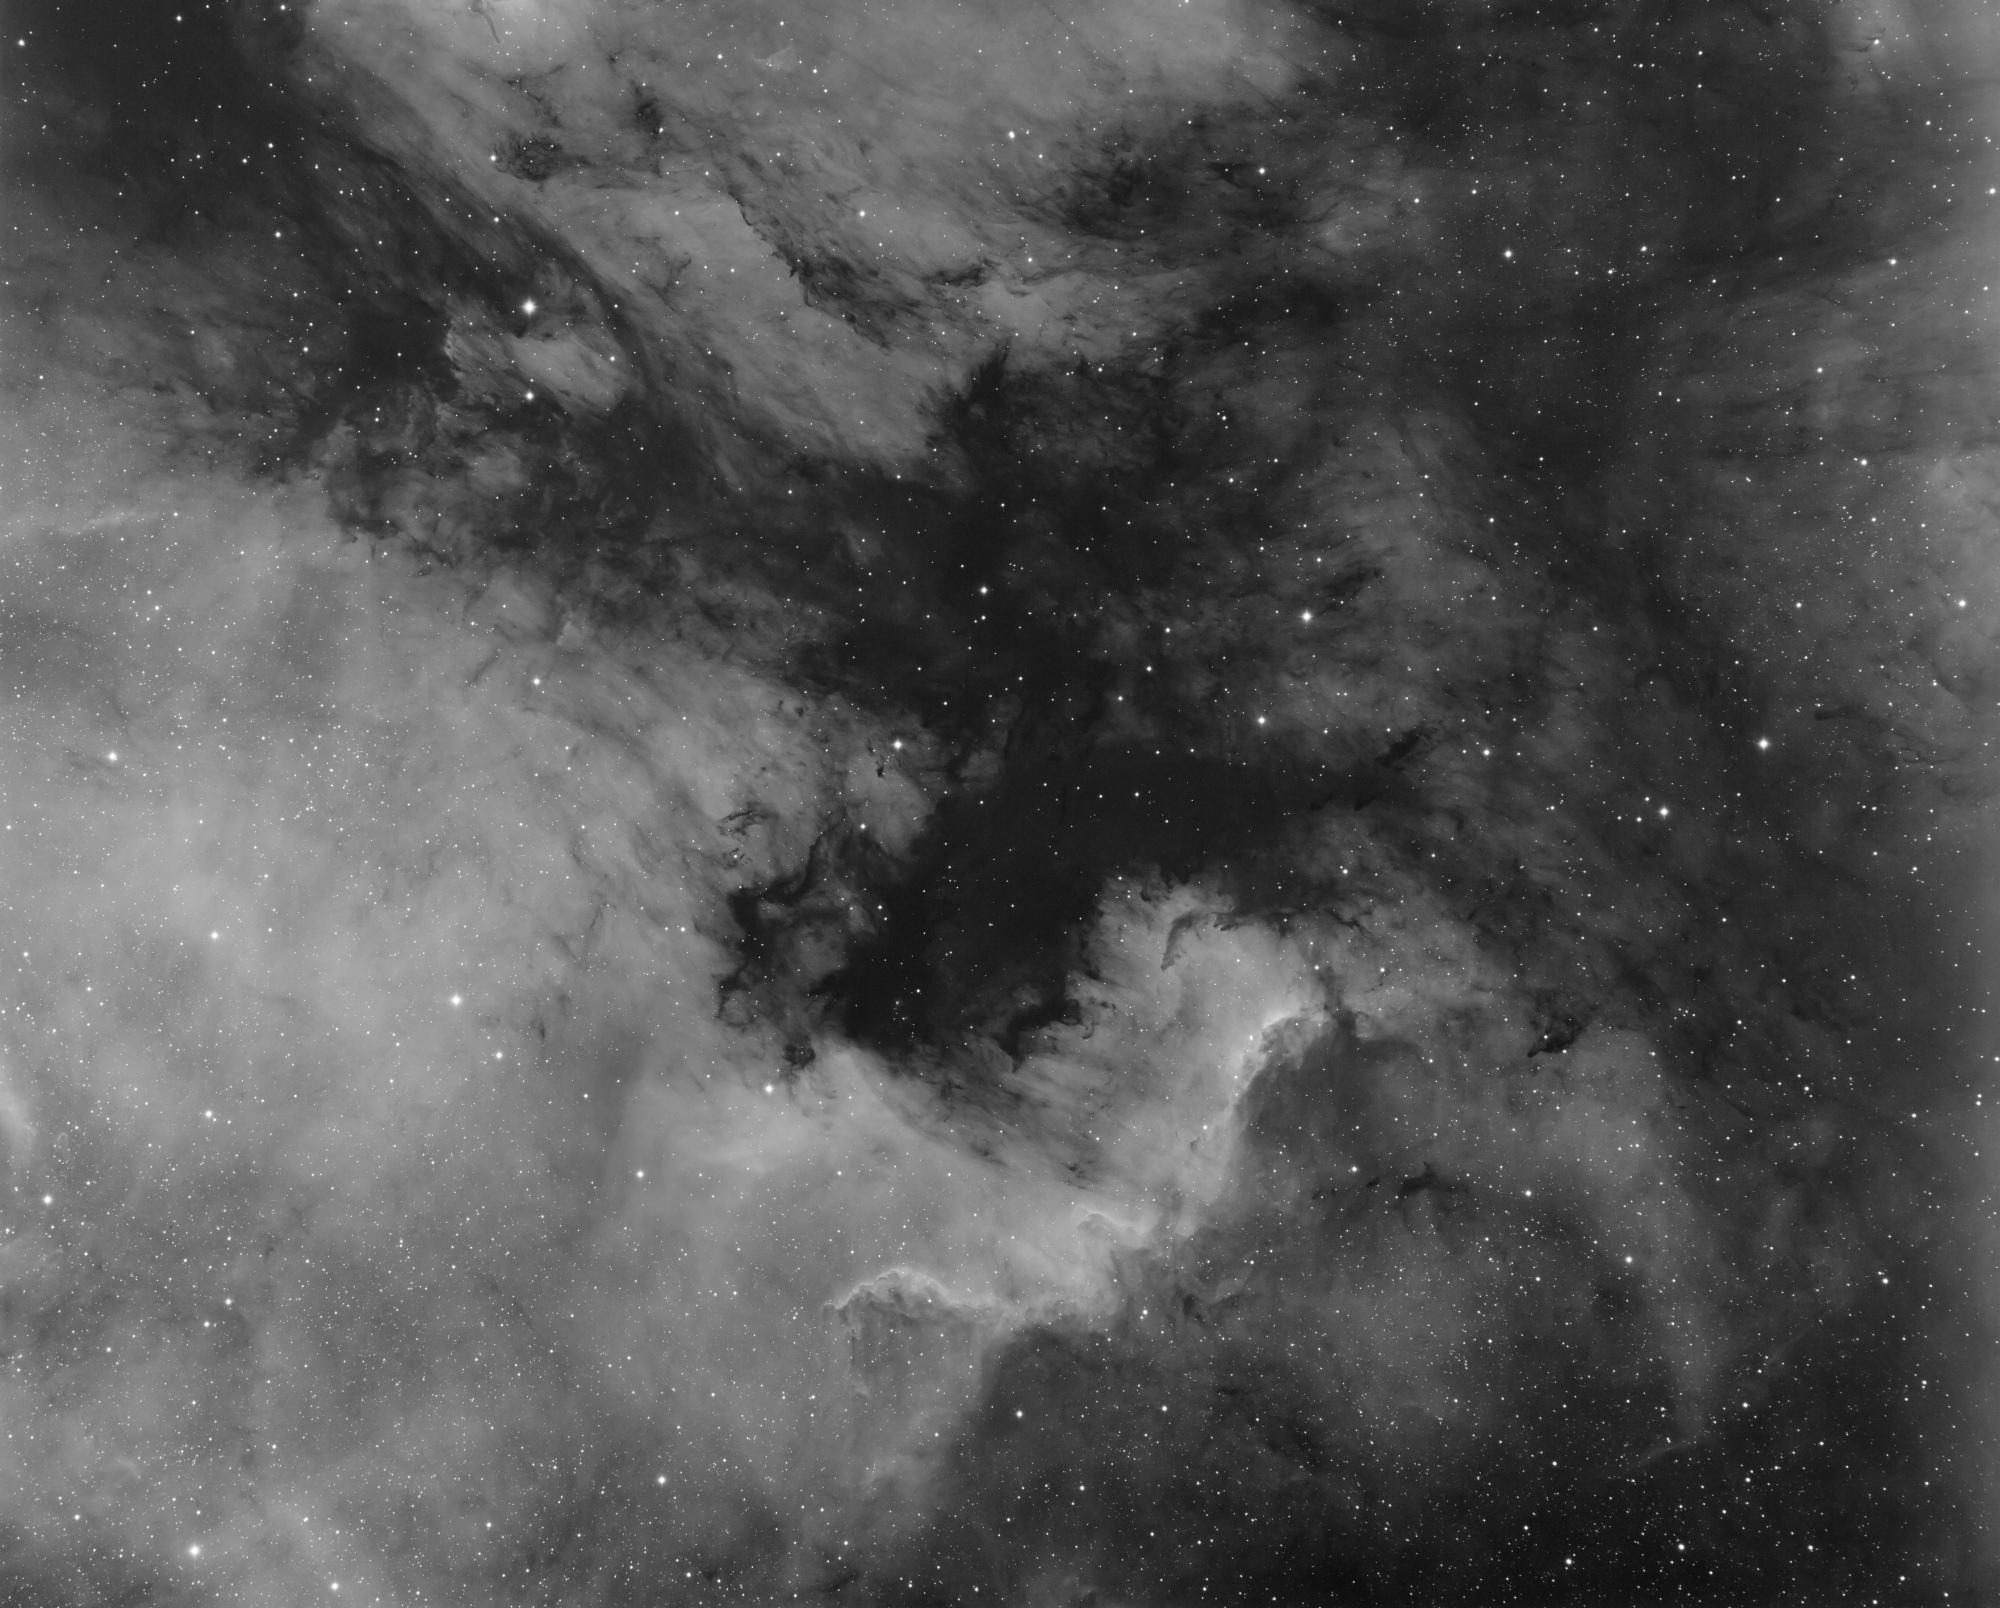 NGC7000_Ha.thumb.jpg.d2d259d541ec25dde5d6d2c29986c890.jpg